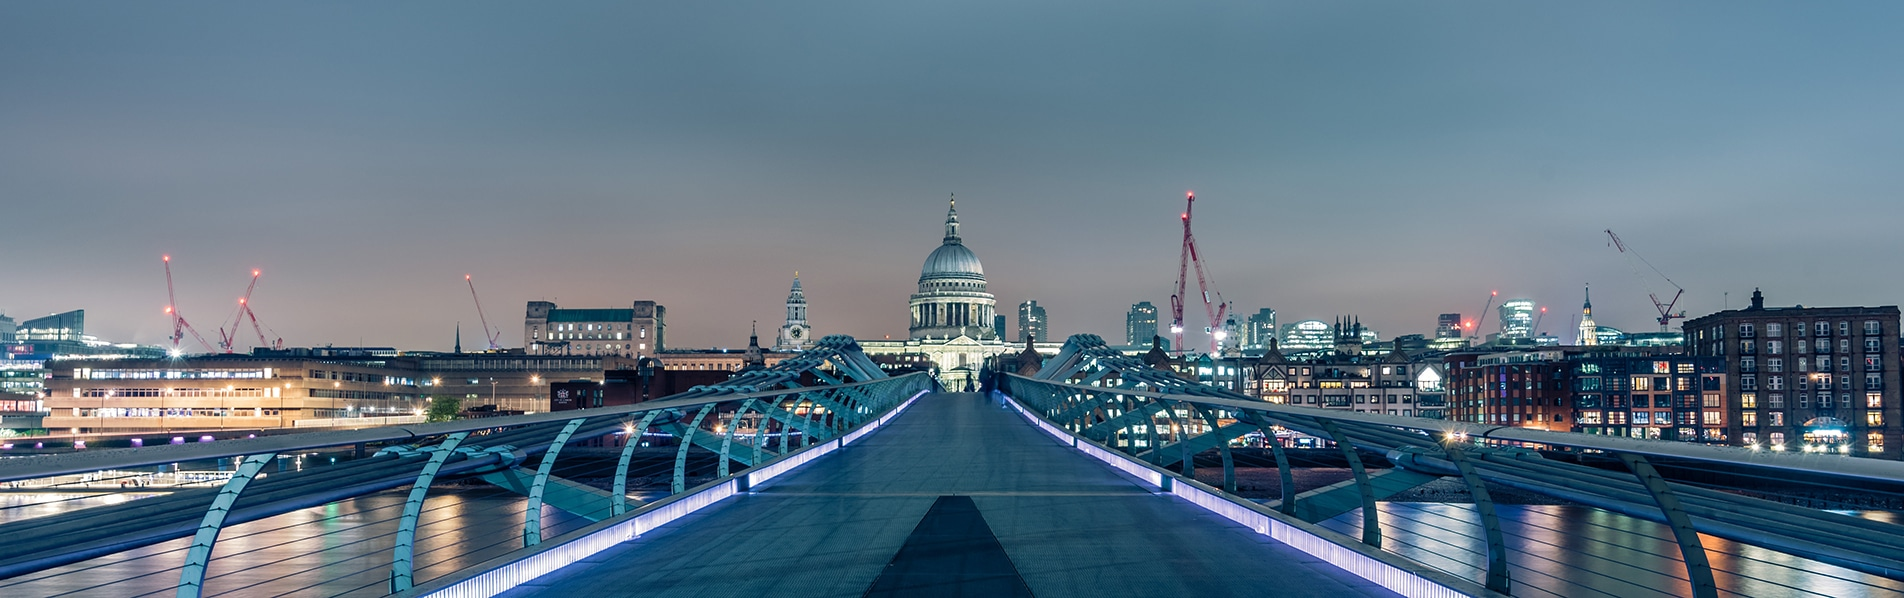 St Paul's Cathedral / Millennium Bridge